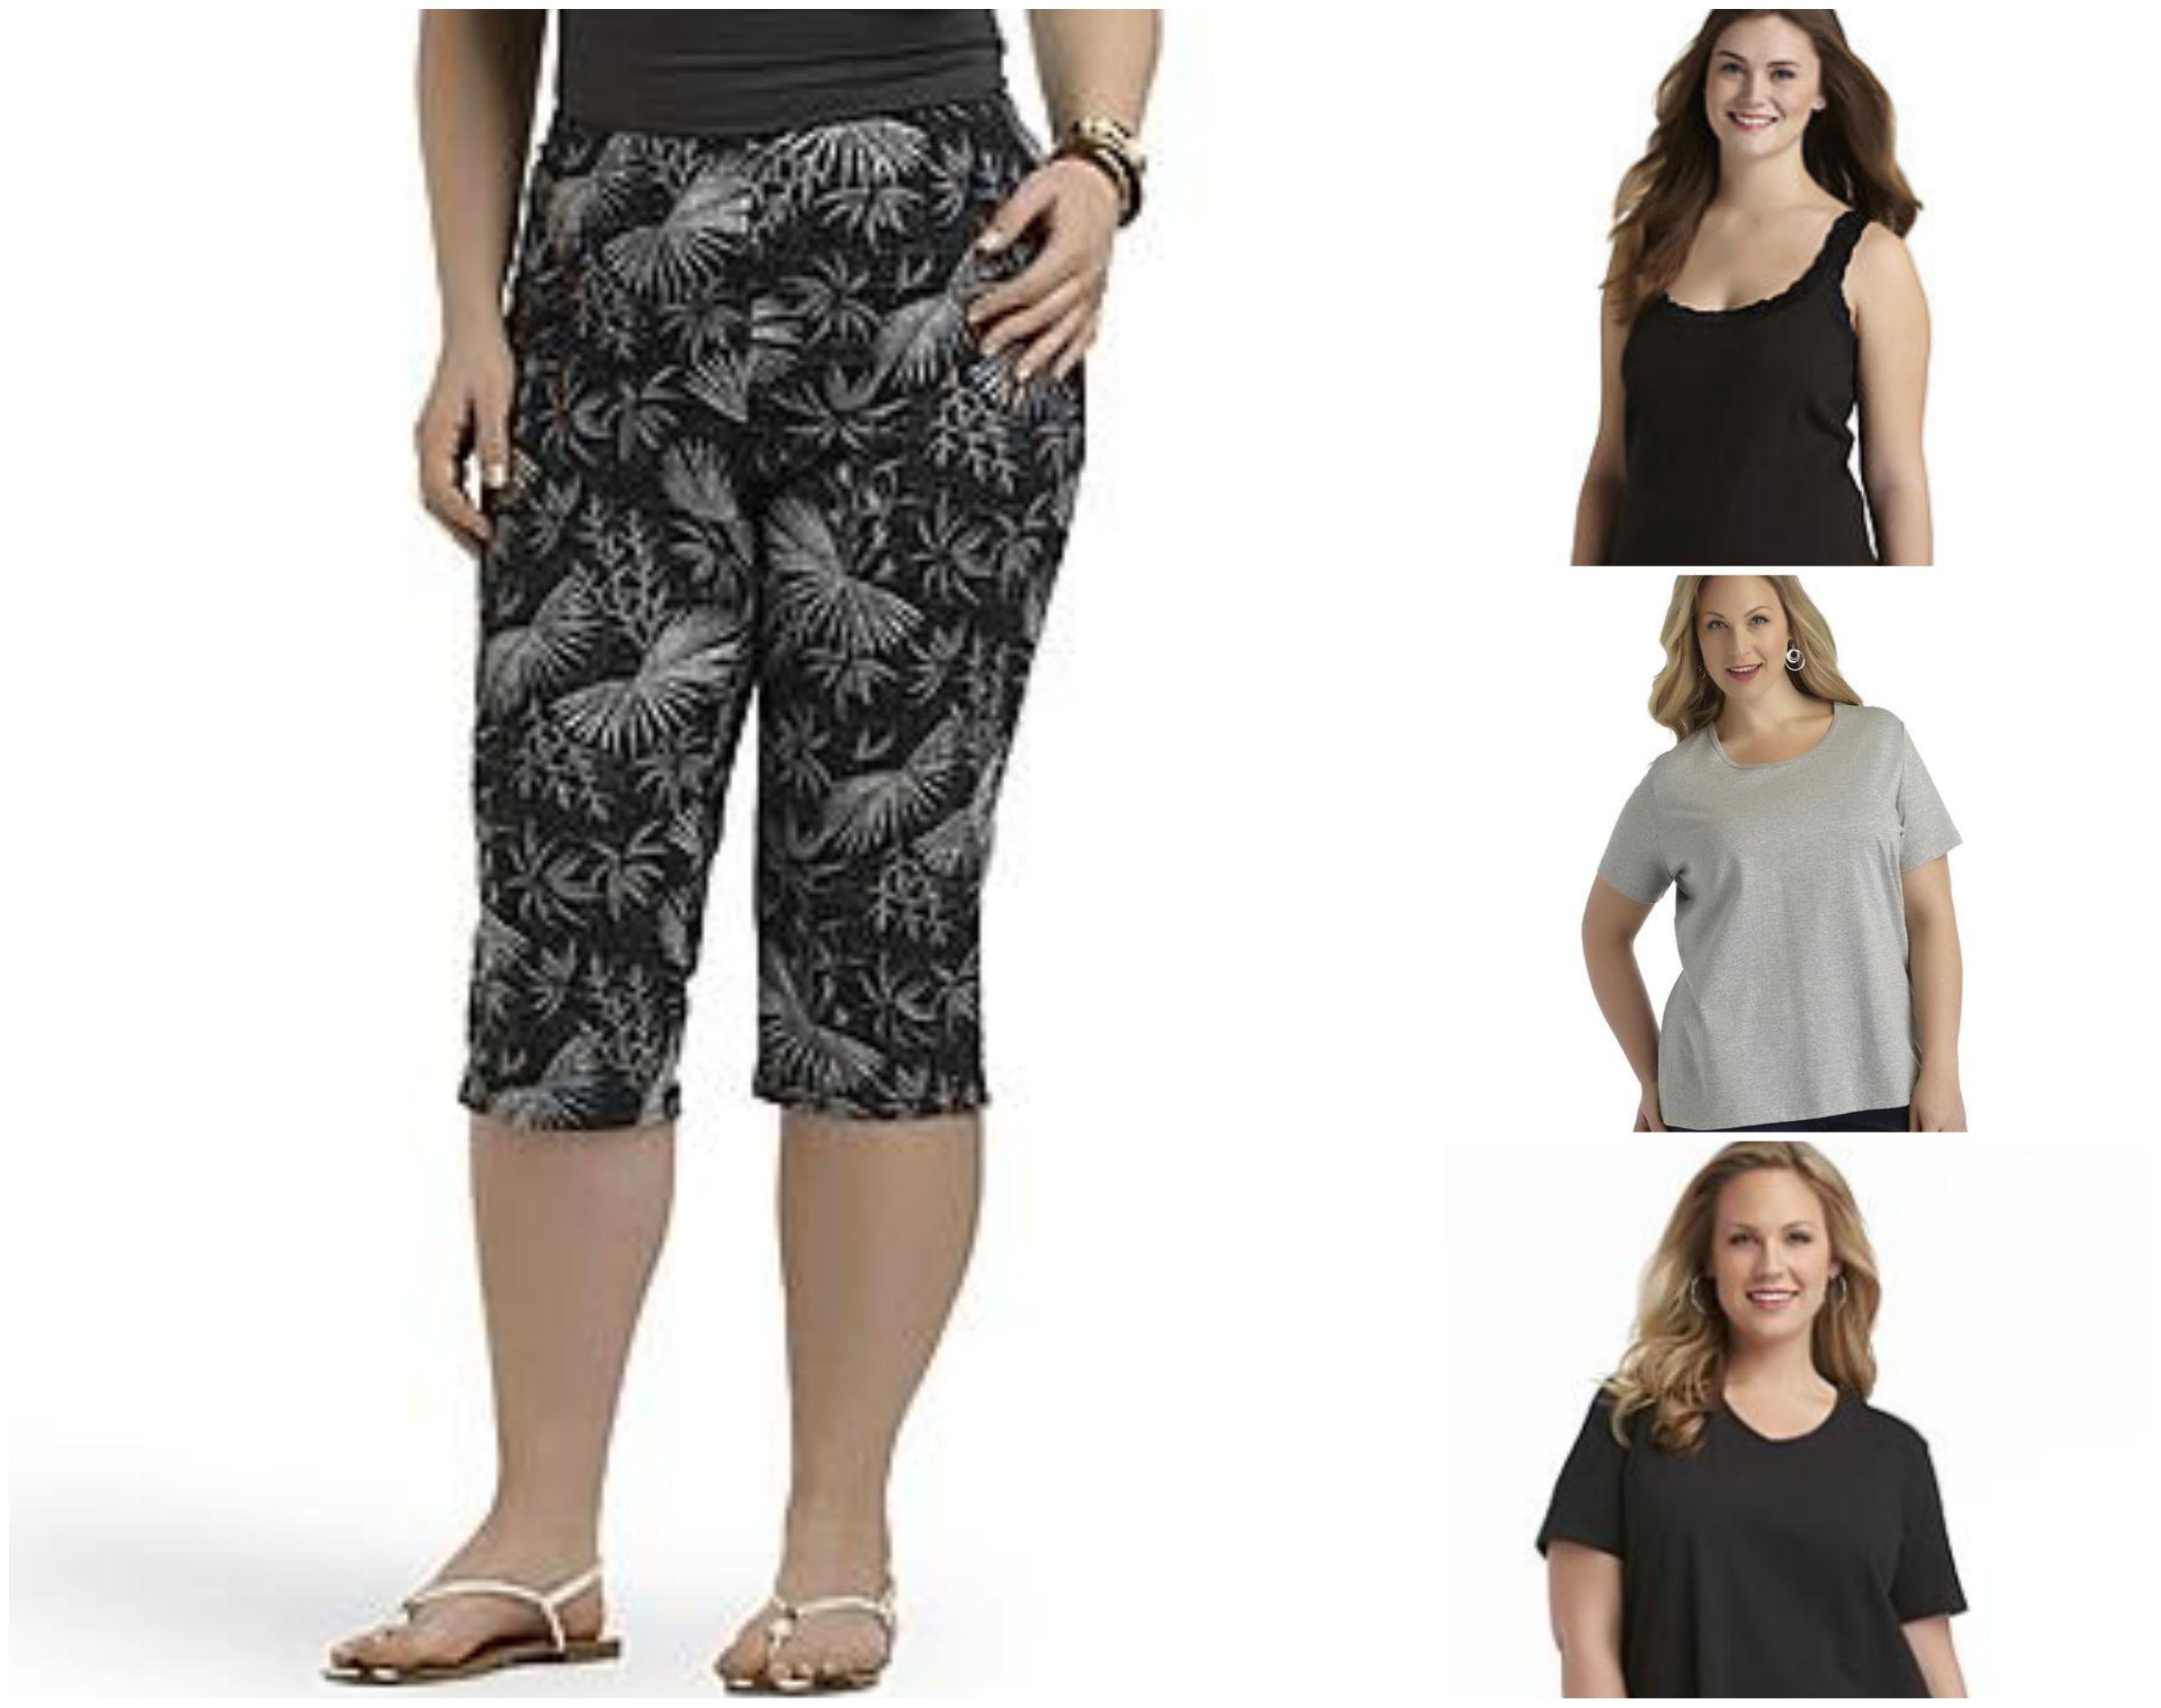 8bf1688b363 Kmart Plus Size Clothing Archives - Affatshionista